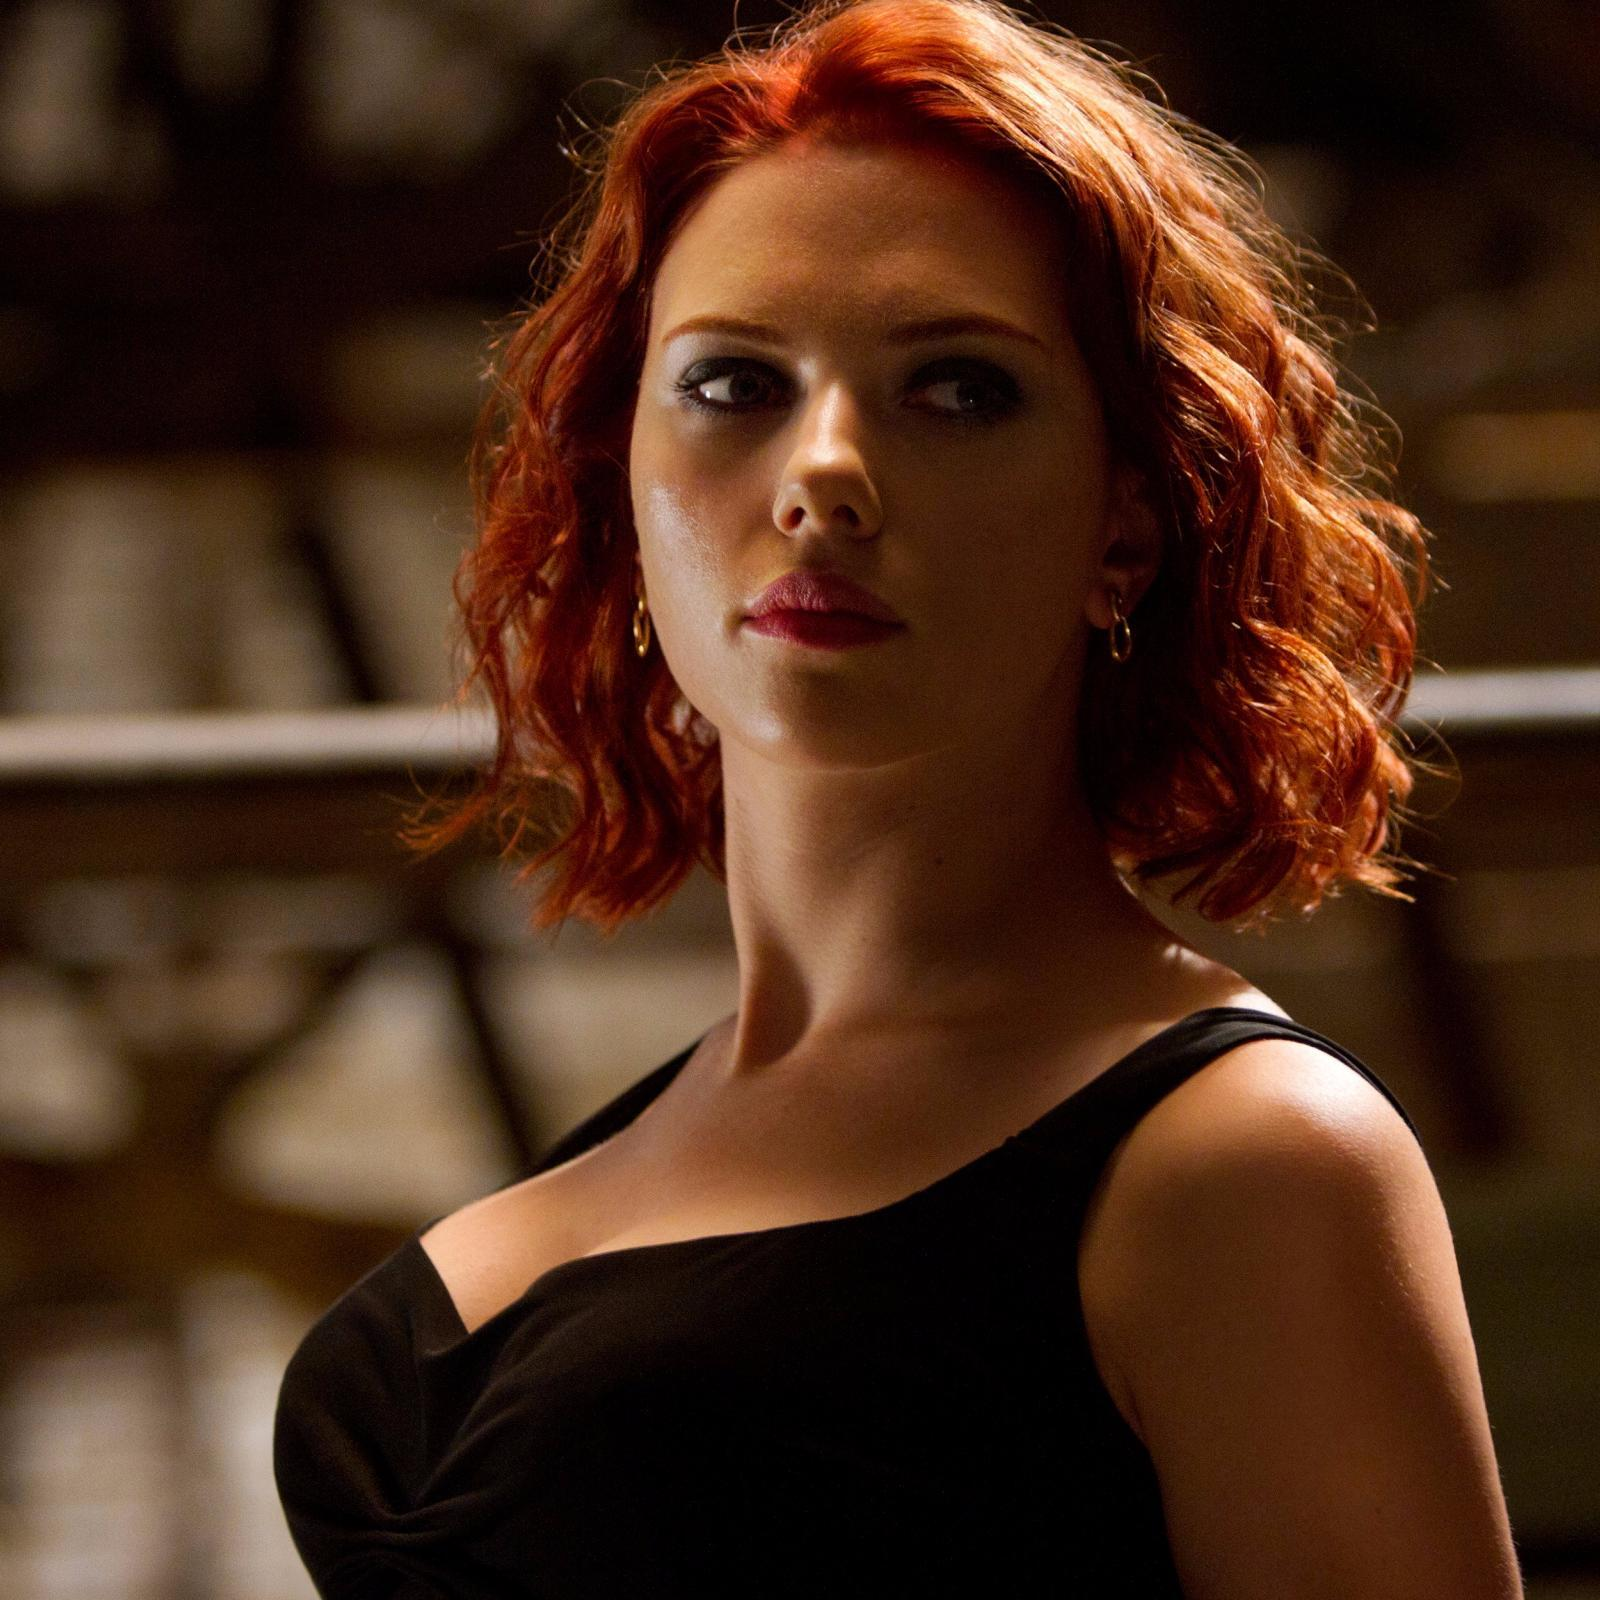 Twitter Scarlett Johansson nudes (89 pics), Twitter